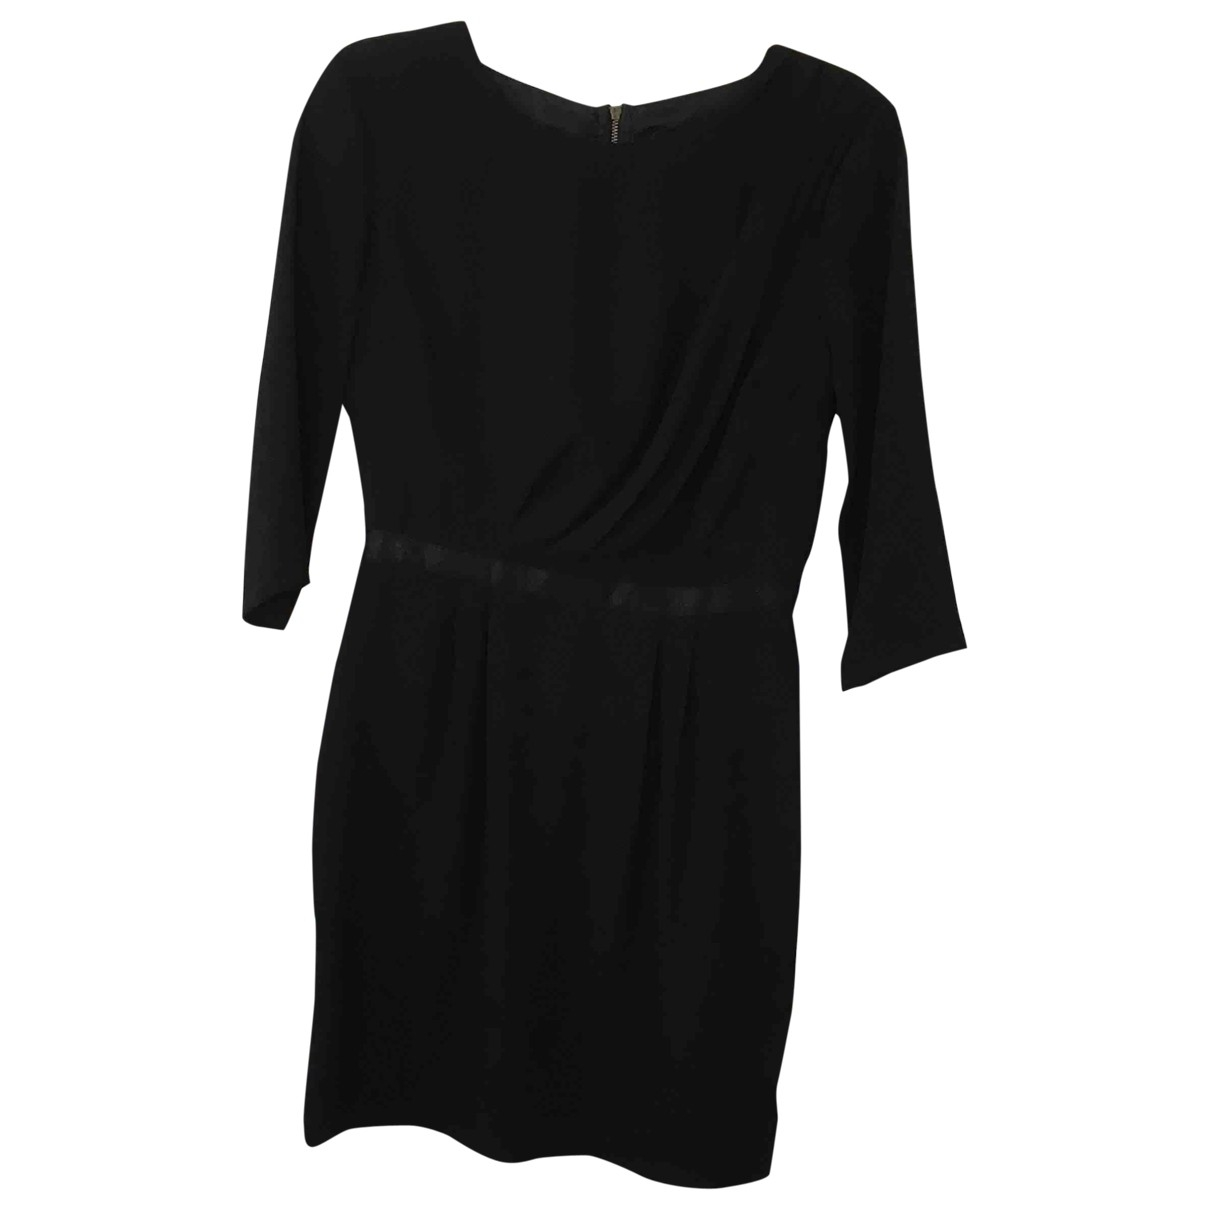 Tophop \N Kleid in  Schwarz Polyester